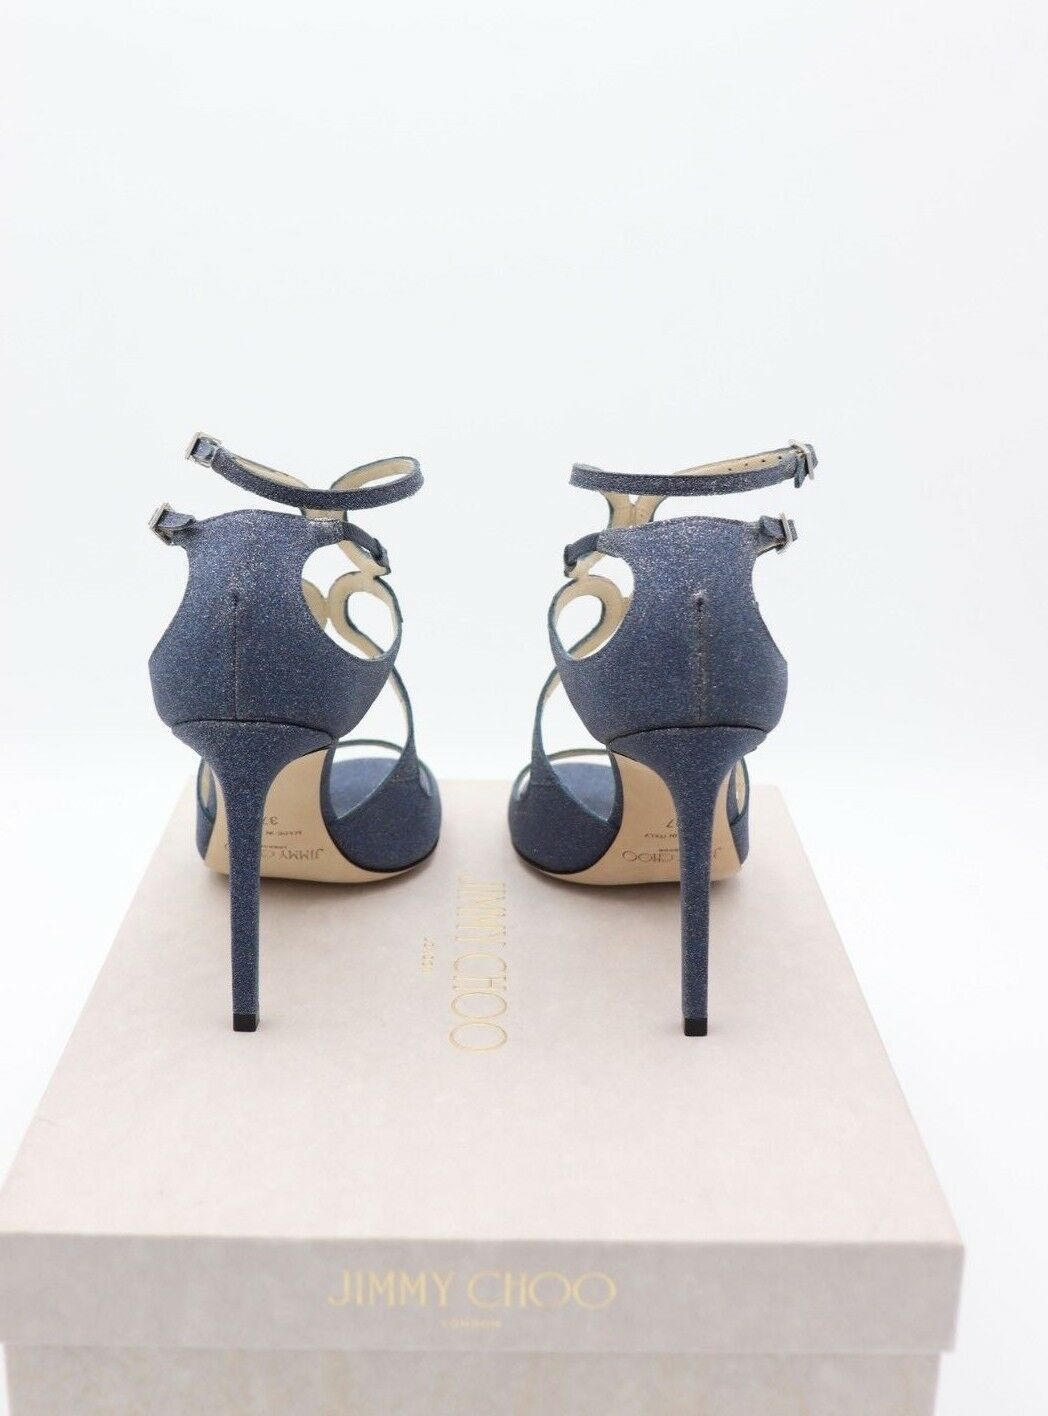 Neu in Box Jimmy Choo Lang Marineblau Fein Glitzer Leder Sandalen Absatz 7 37